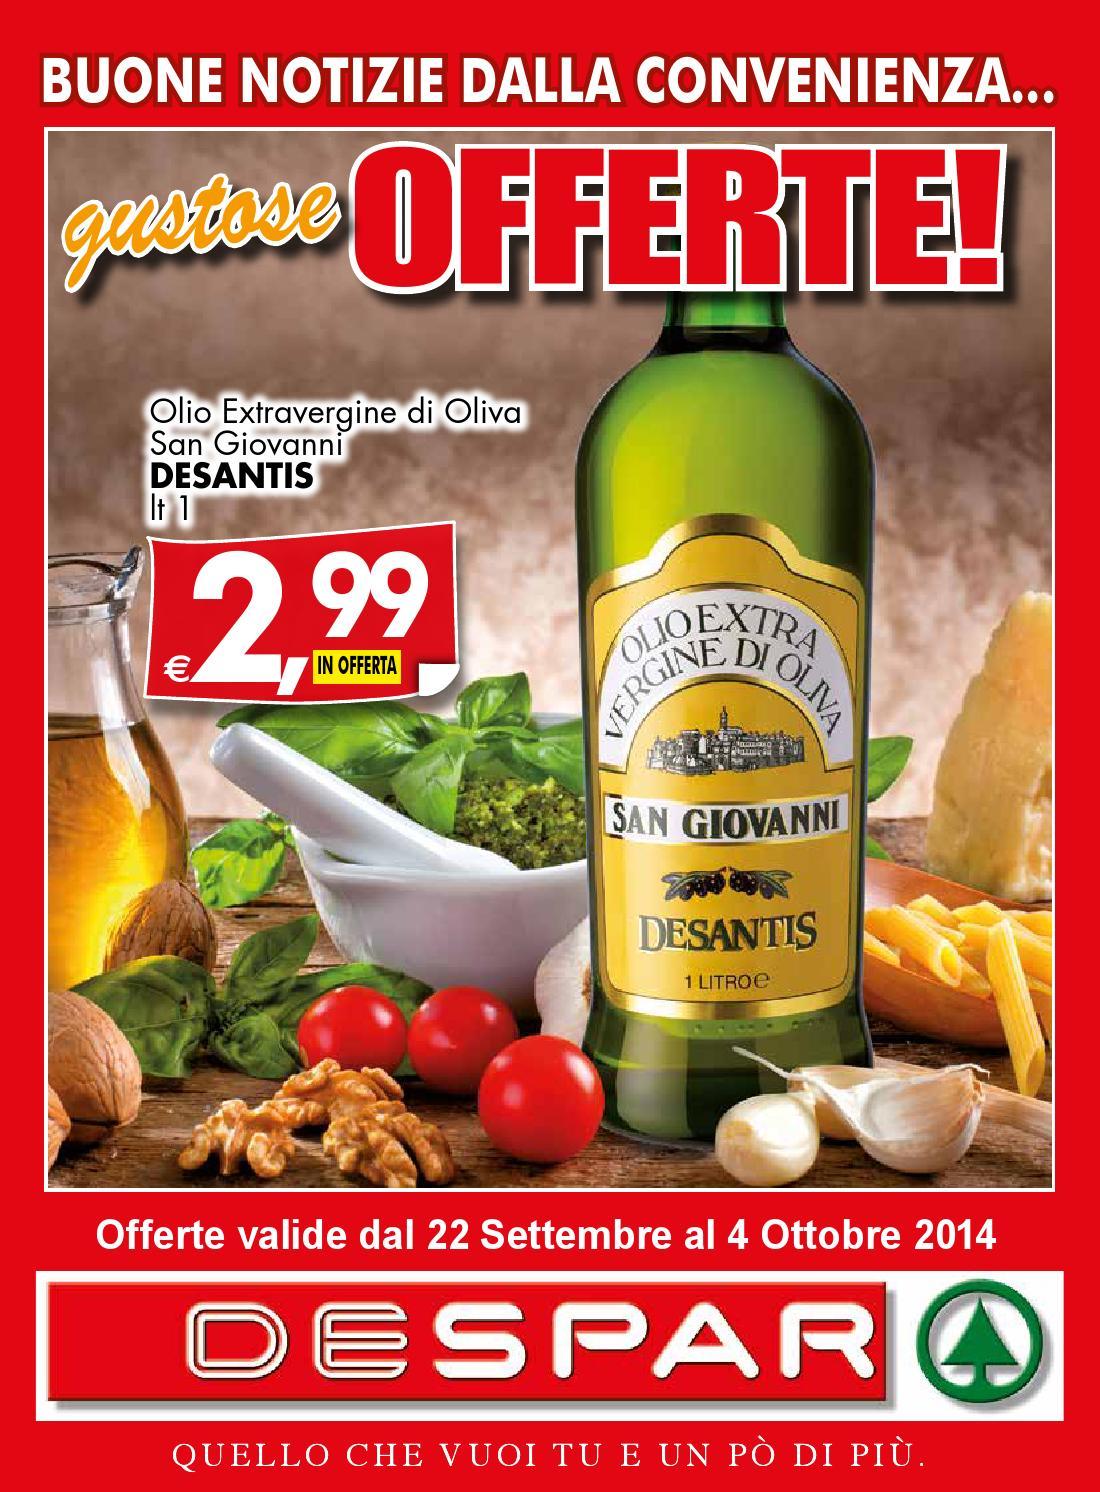 Volantino despar affiliati 22 settembre 4 ottobre 2014 for Volantino offerte despar messina